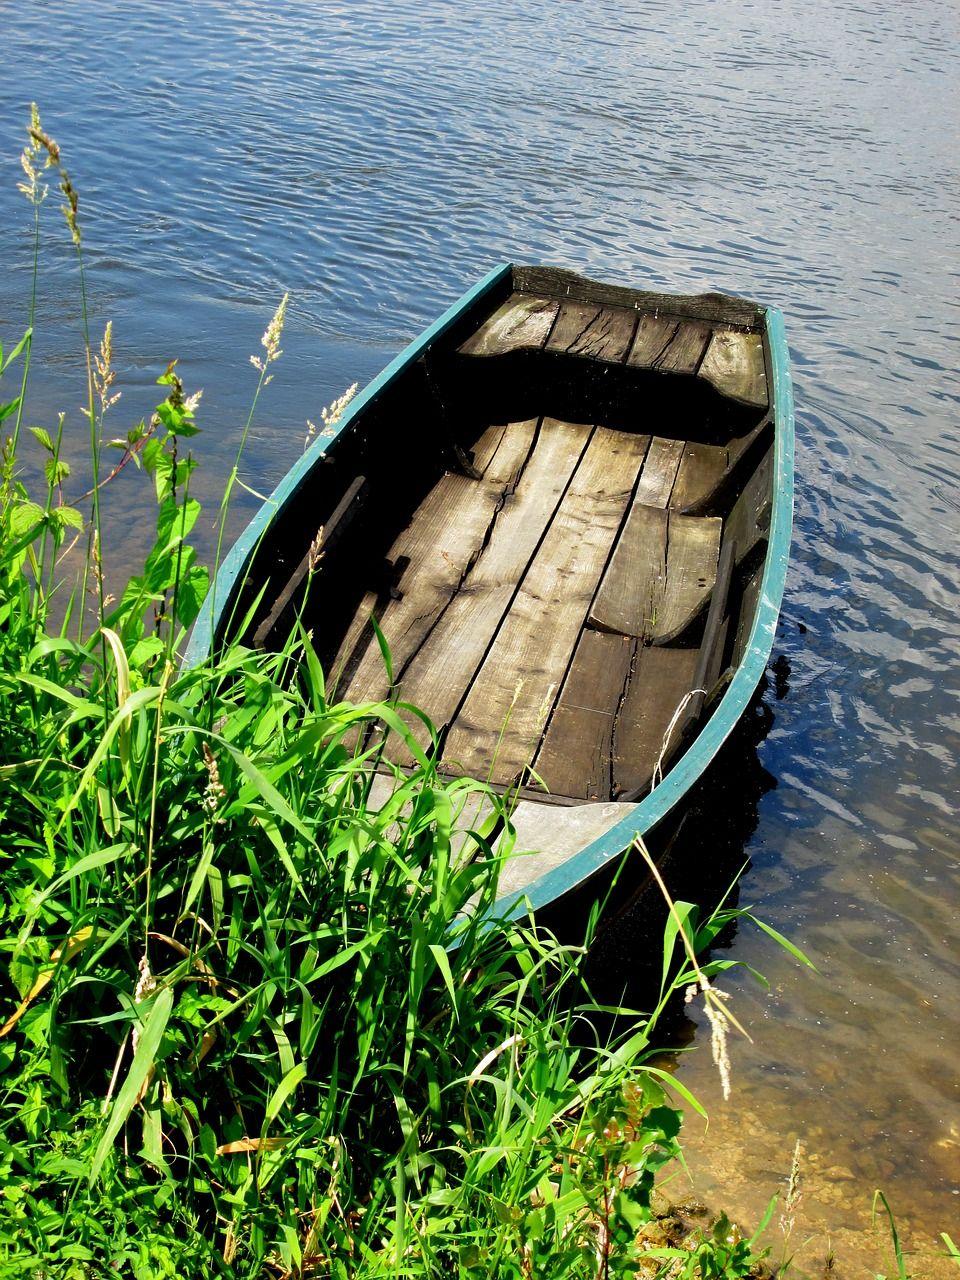 Boat boat river water calm nature boat boat